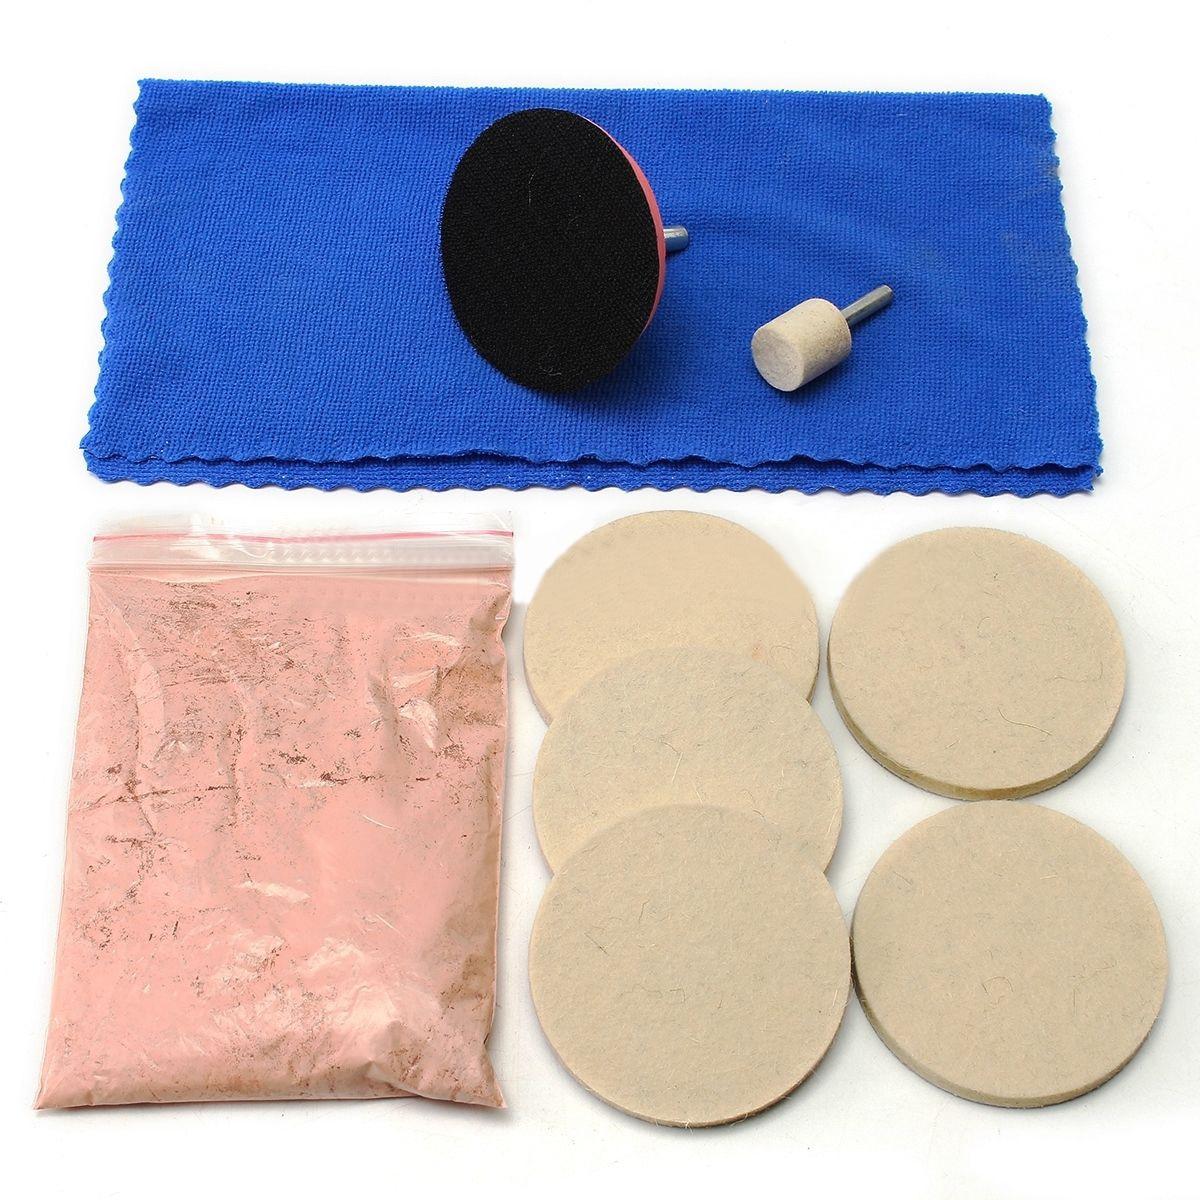 OSSIEAO 100g Cerium Oxide Glass Polishing Kit Windscreen Scratch Remover + 3 Pad + Felt